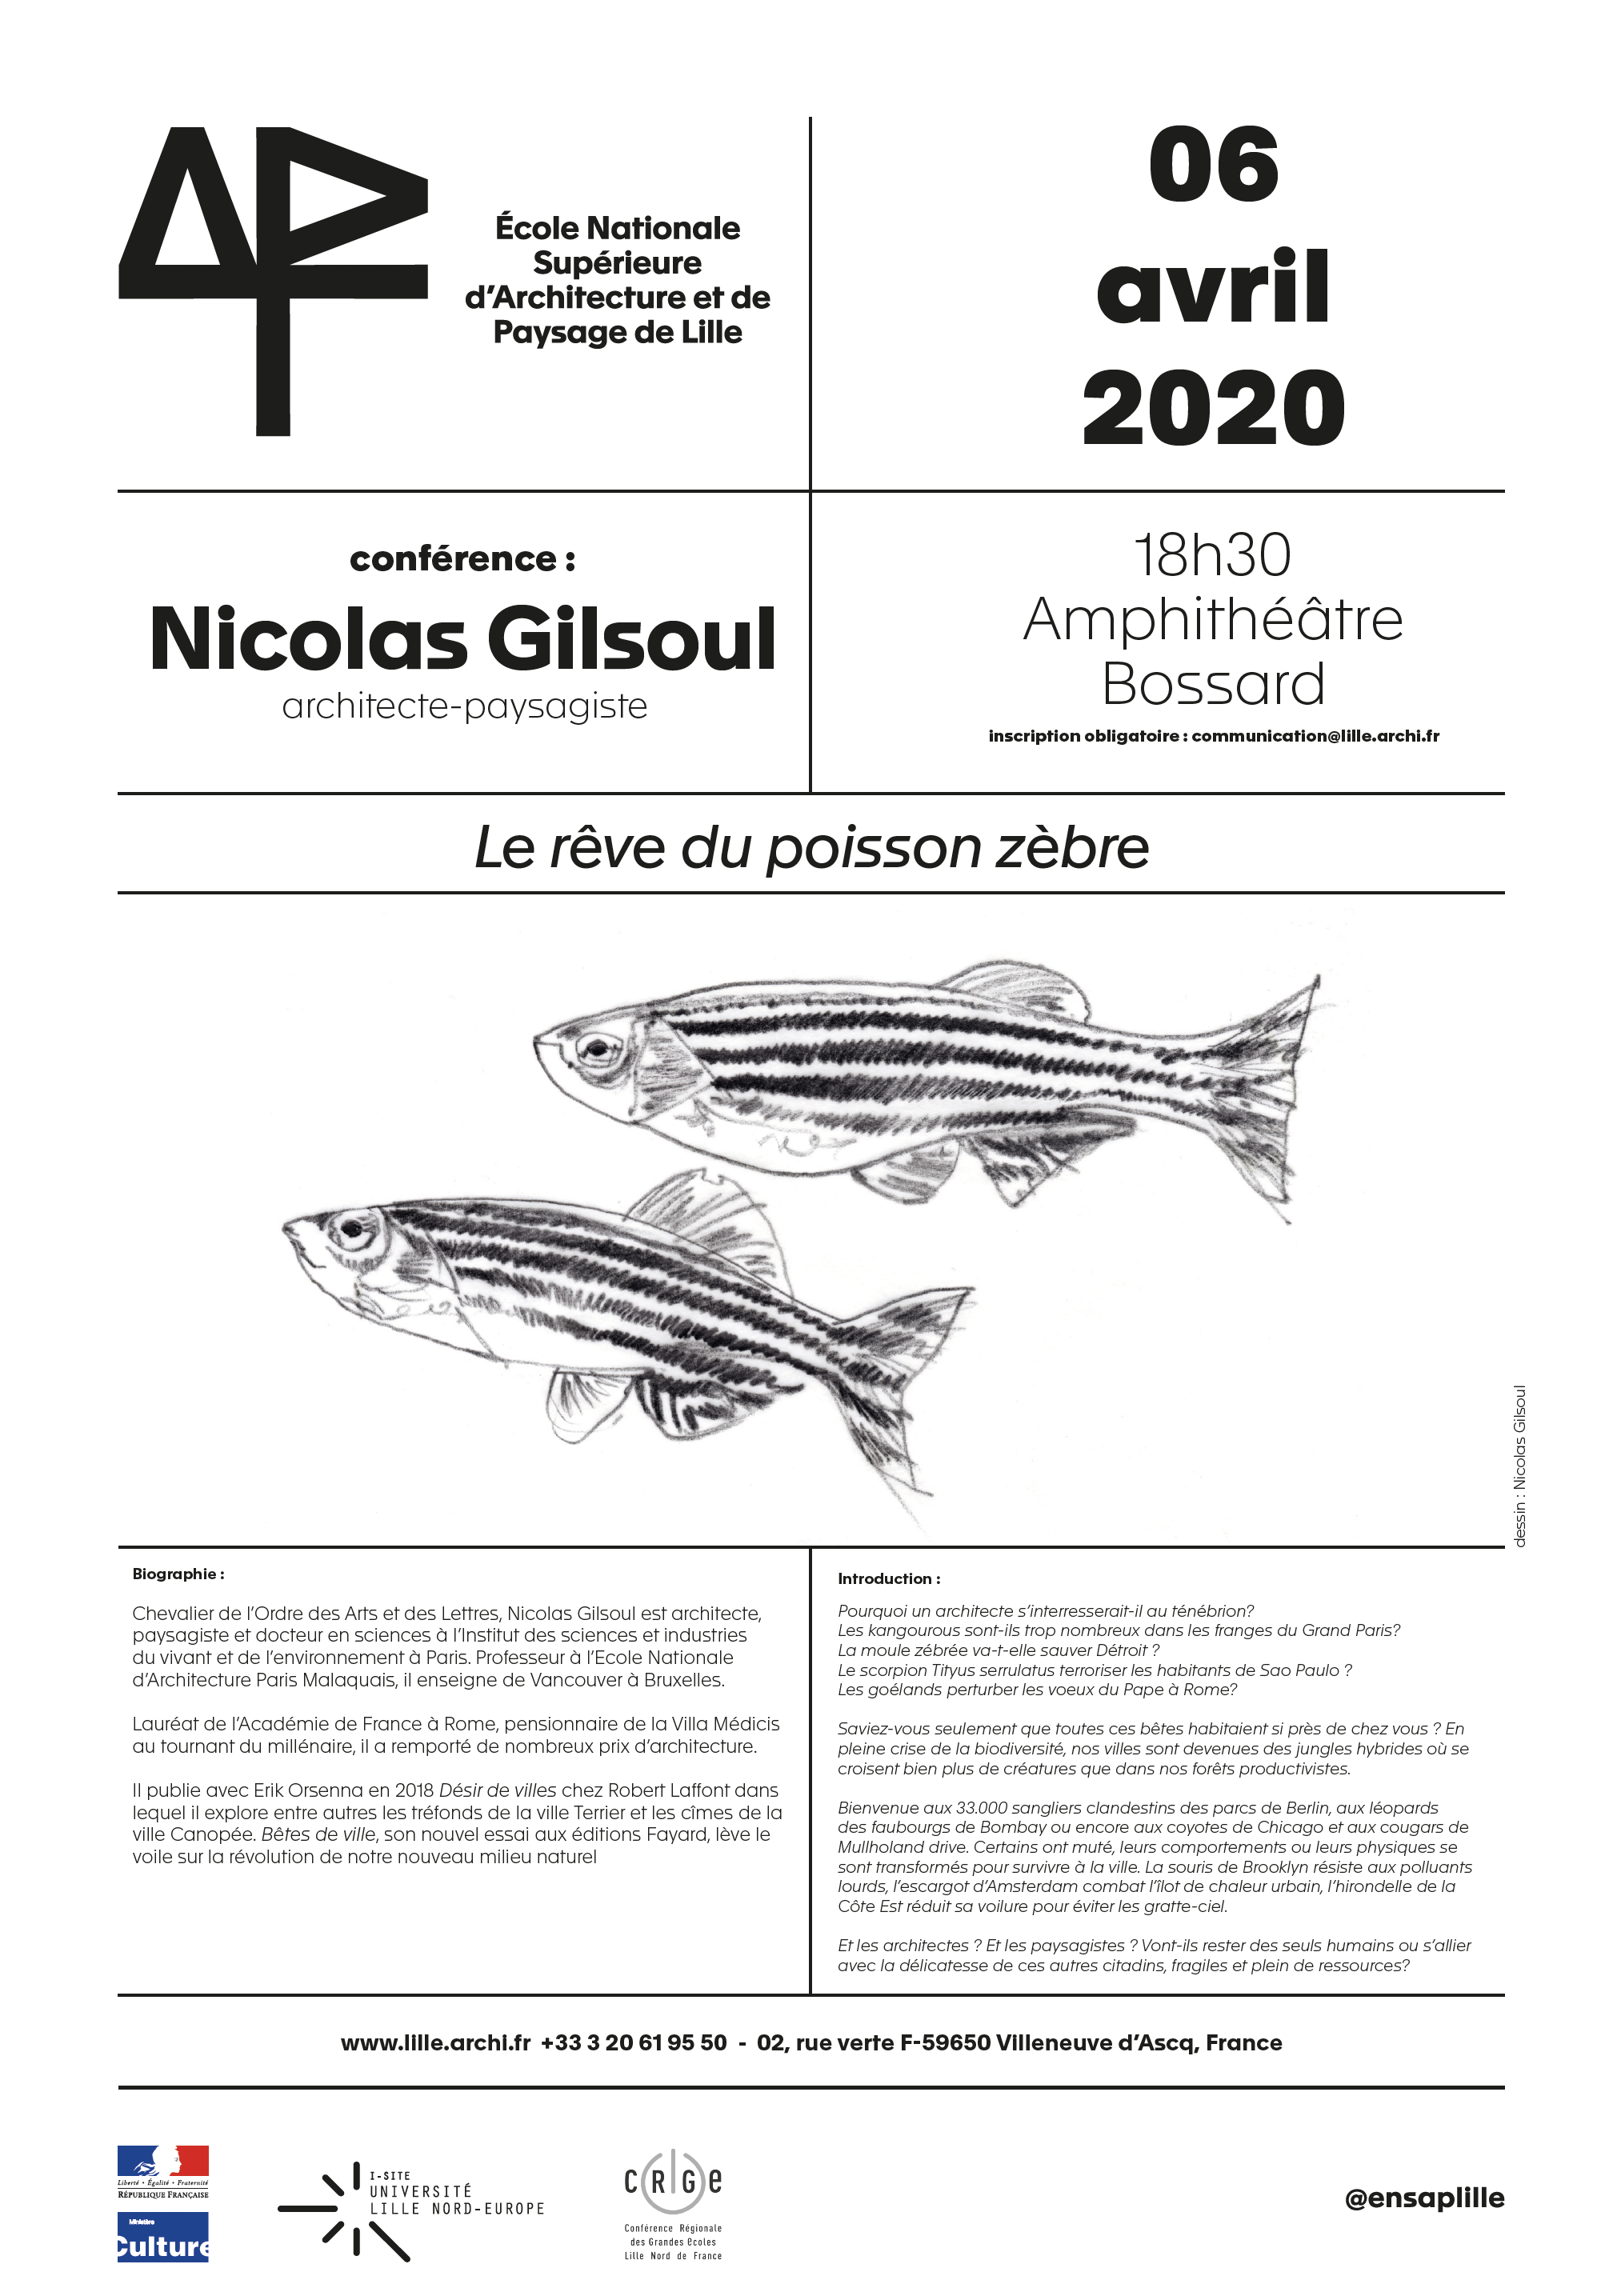 Conférence de Nicolas Gilsoul 06/04/2020